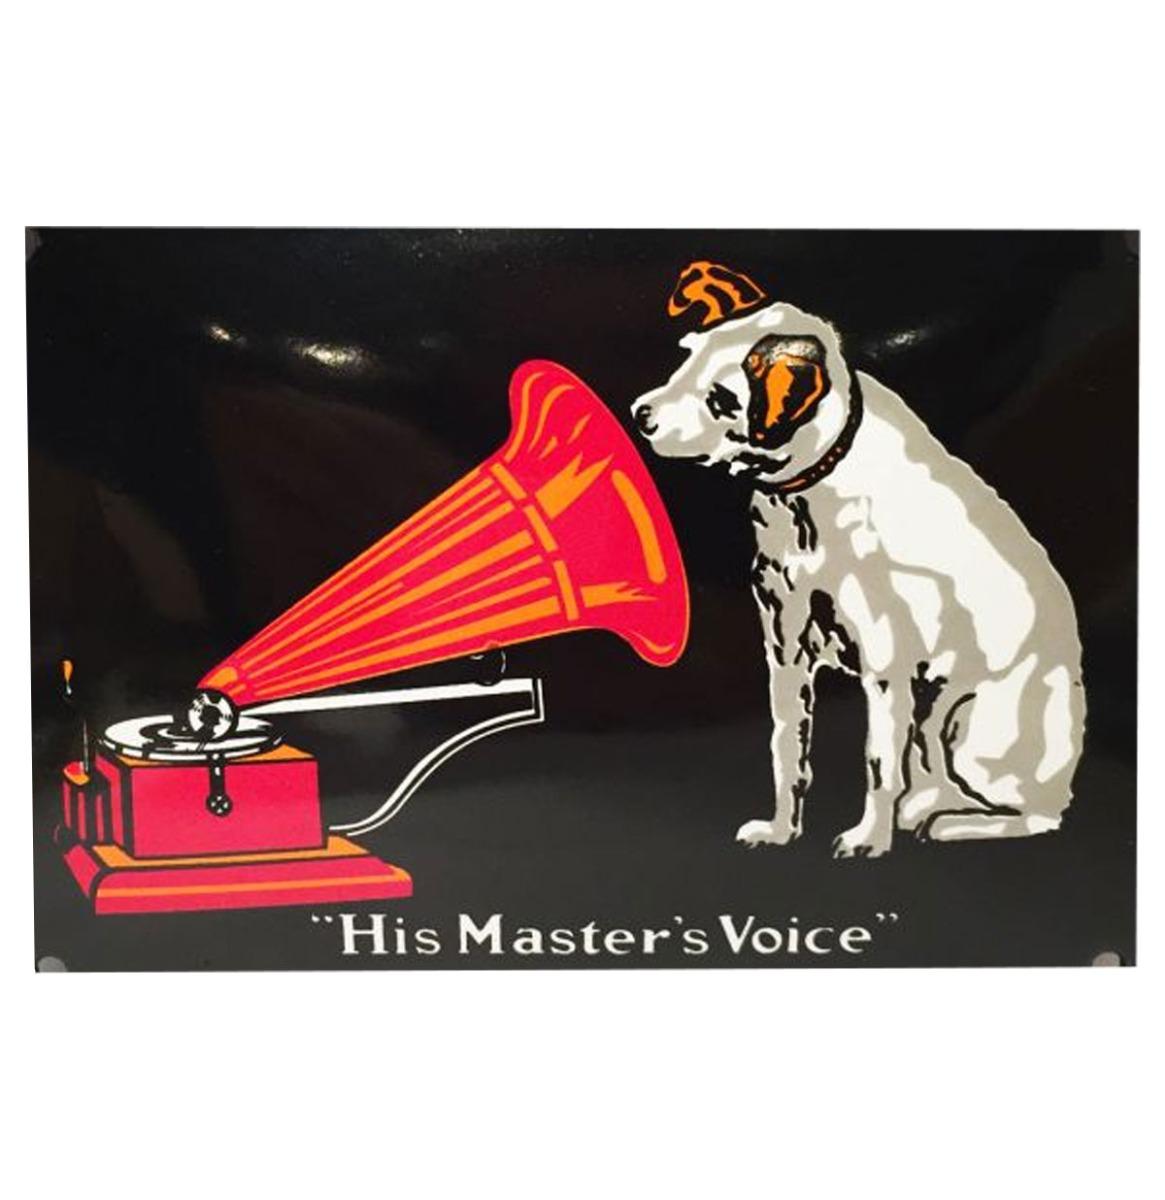 His Master's Voice Metalen Bord - 8 x 11 cm